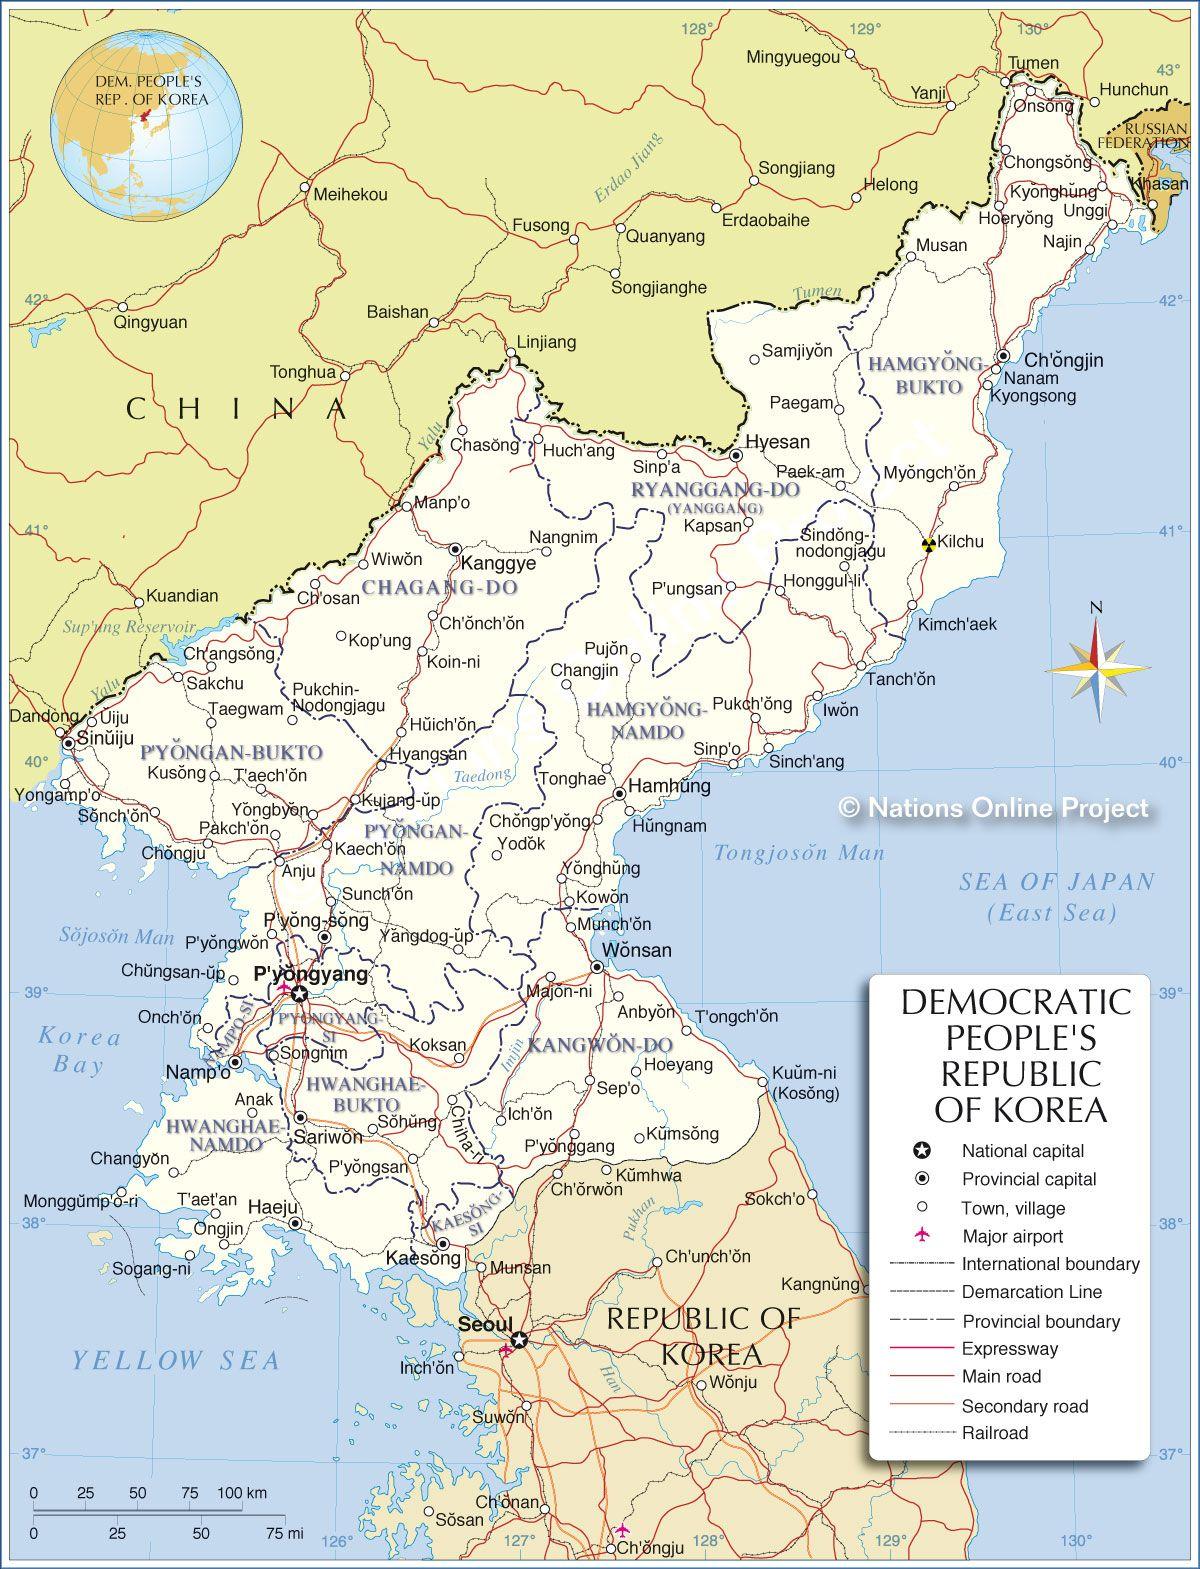 North korea map north korea pinterest north korea korea and asia map showing north korea and the surrounding countries gumiabroncs Images